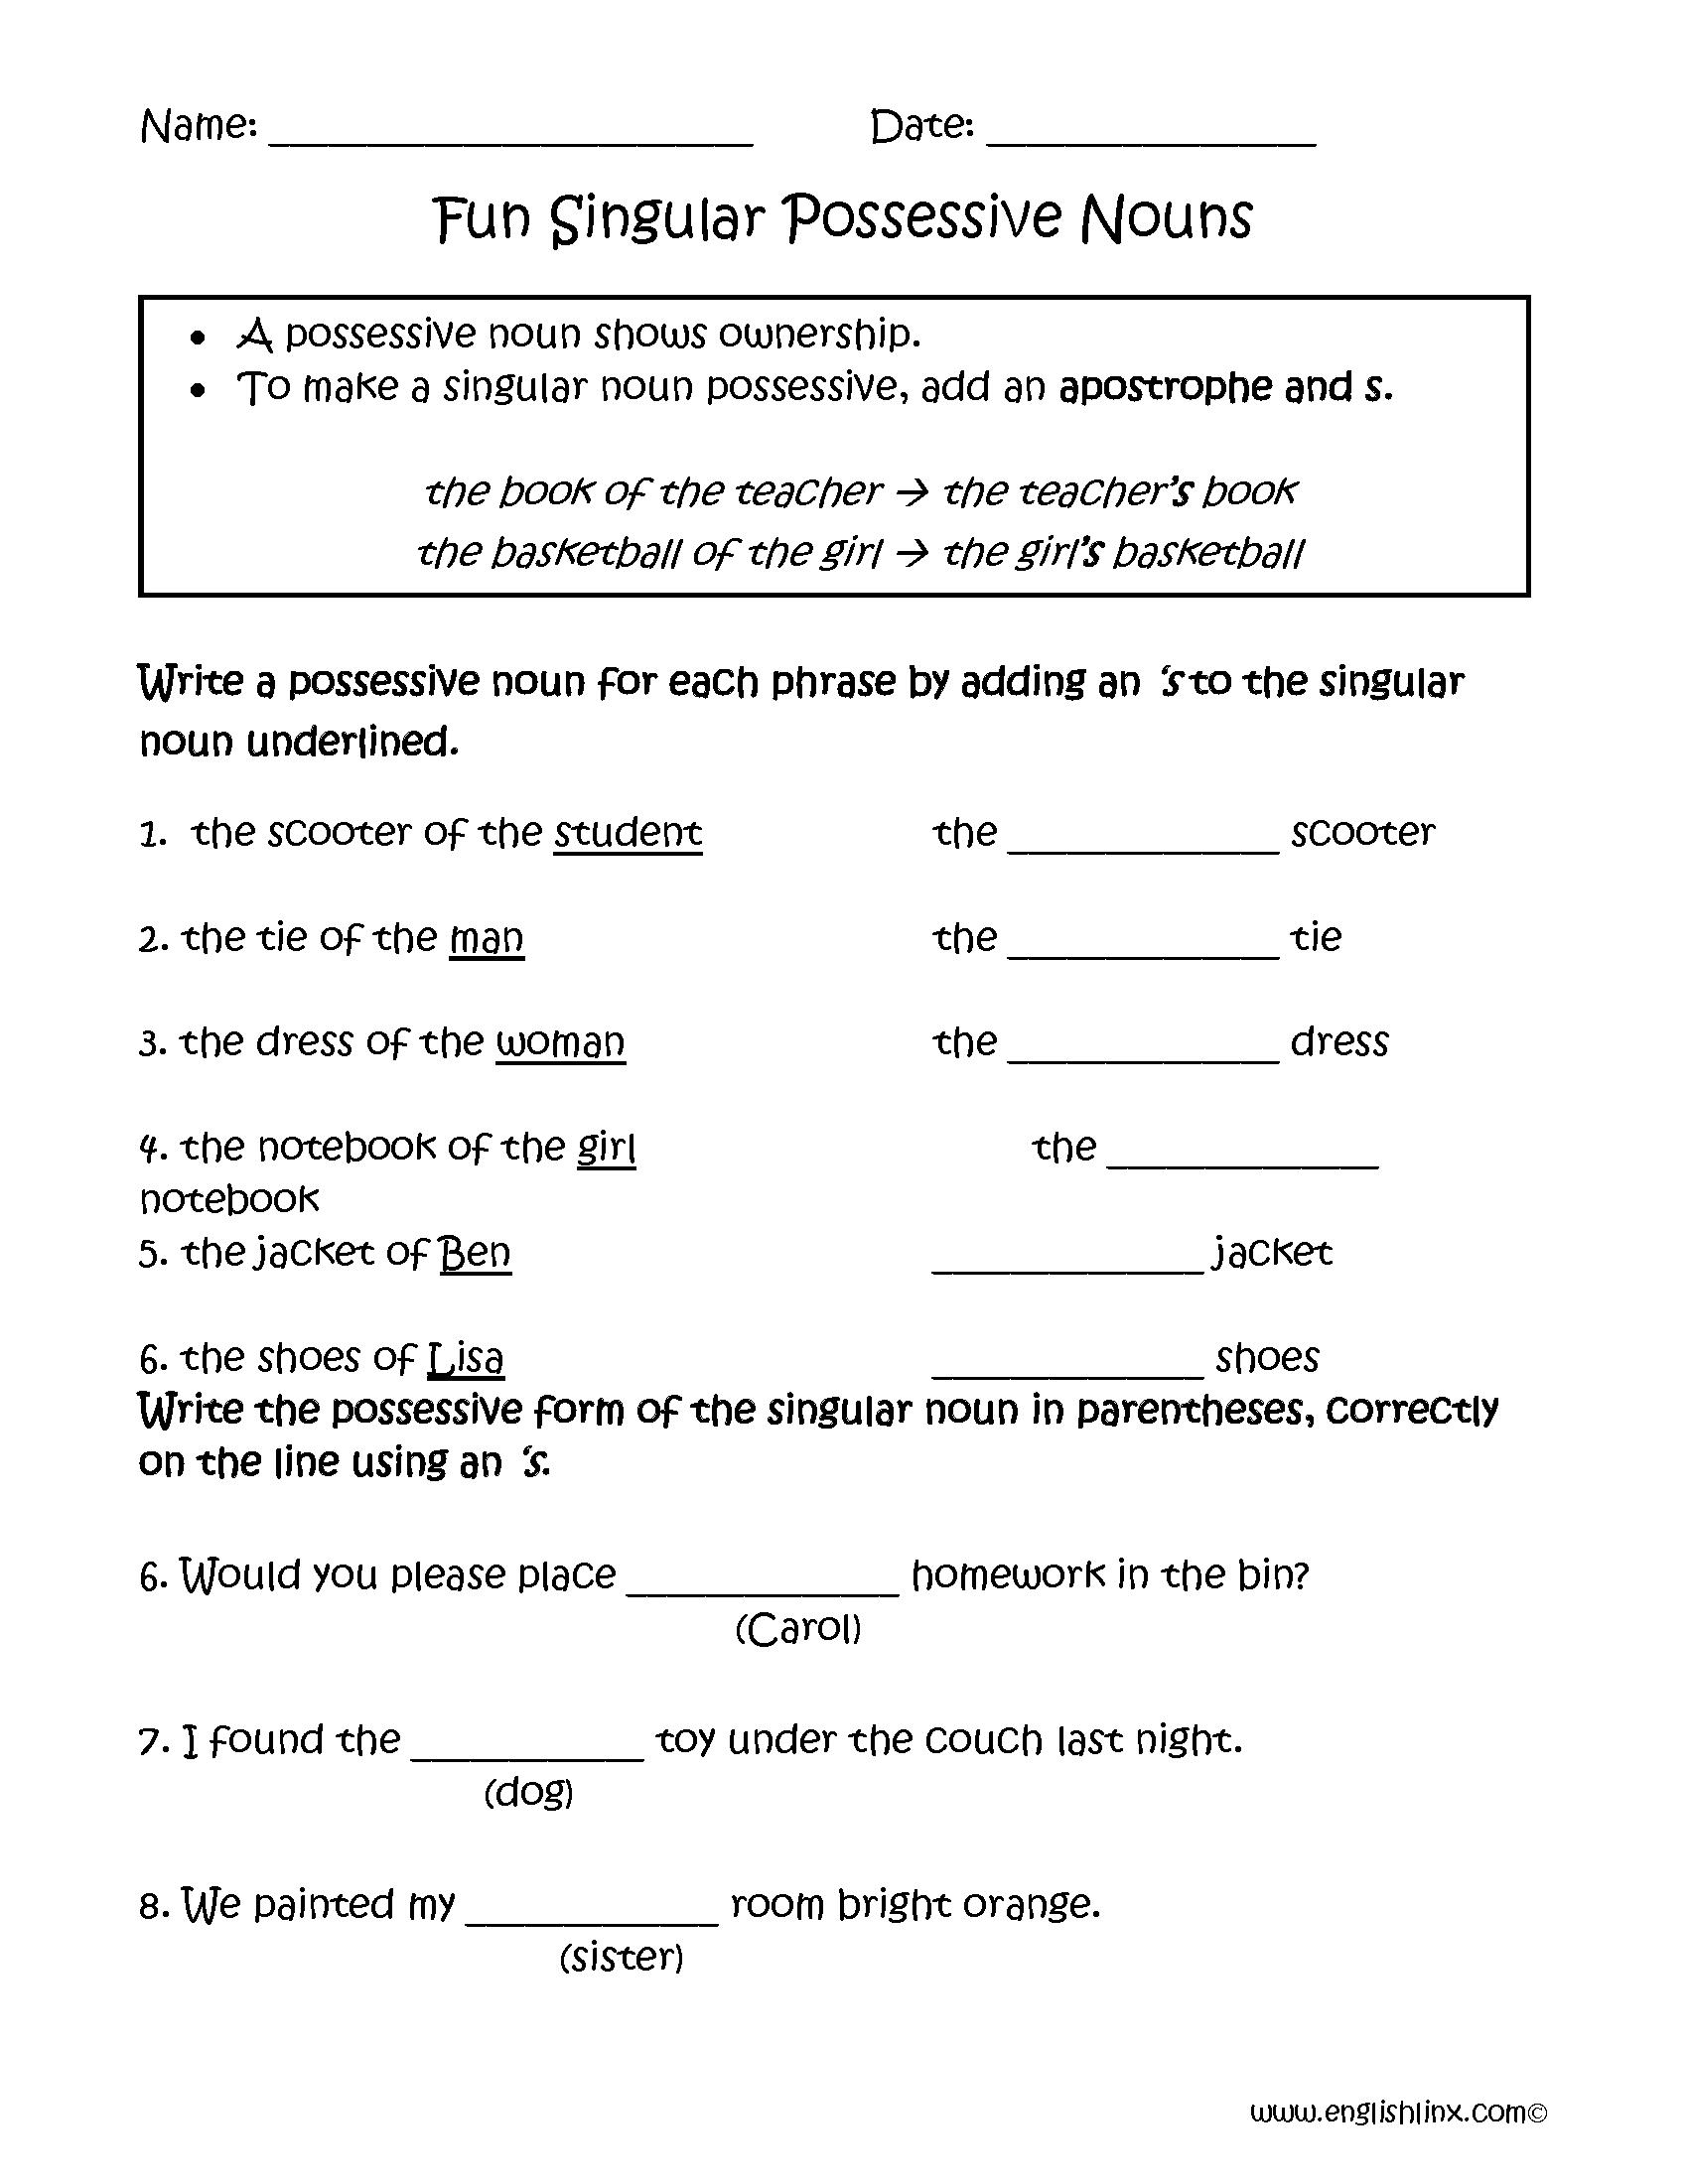 Worksheets Fun Grammar Worksheets fun singular possessive nouns worksheets worksheets